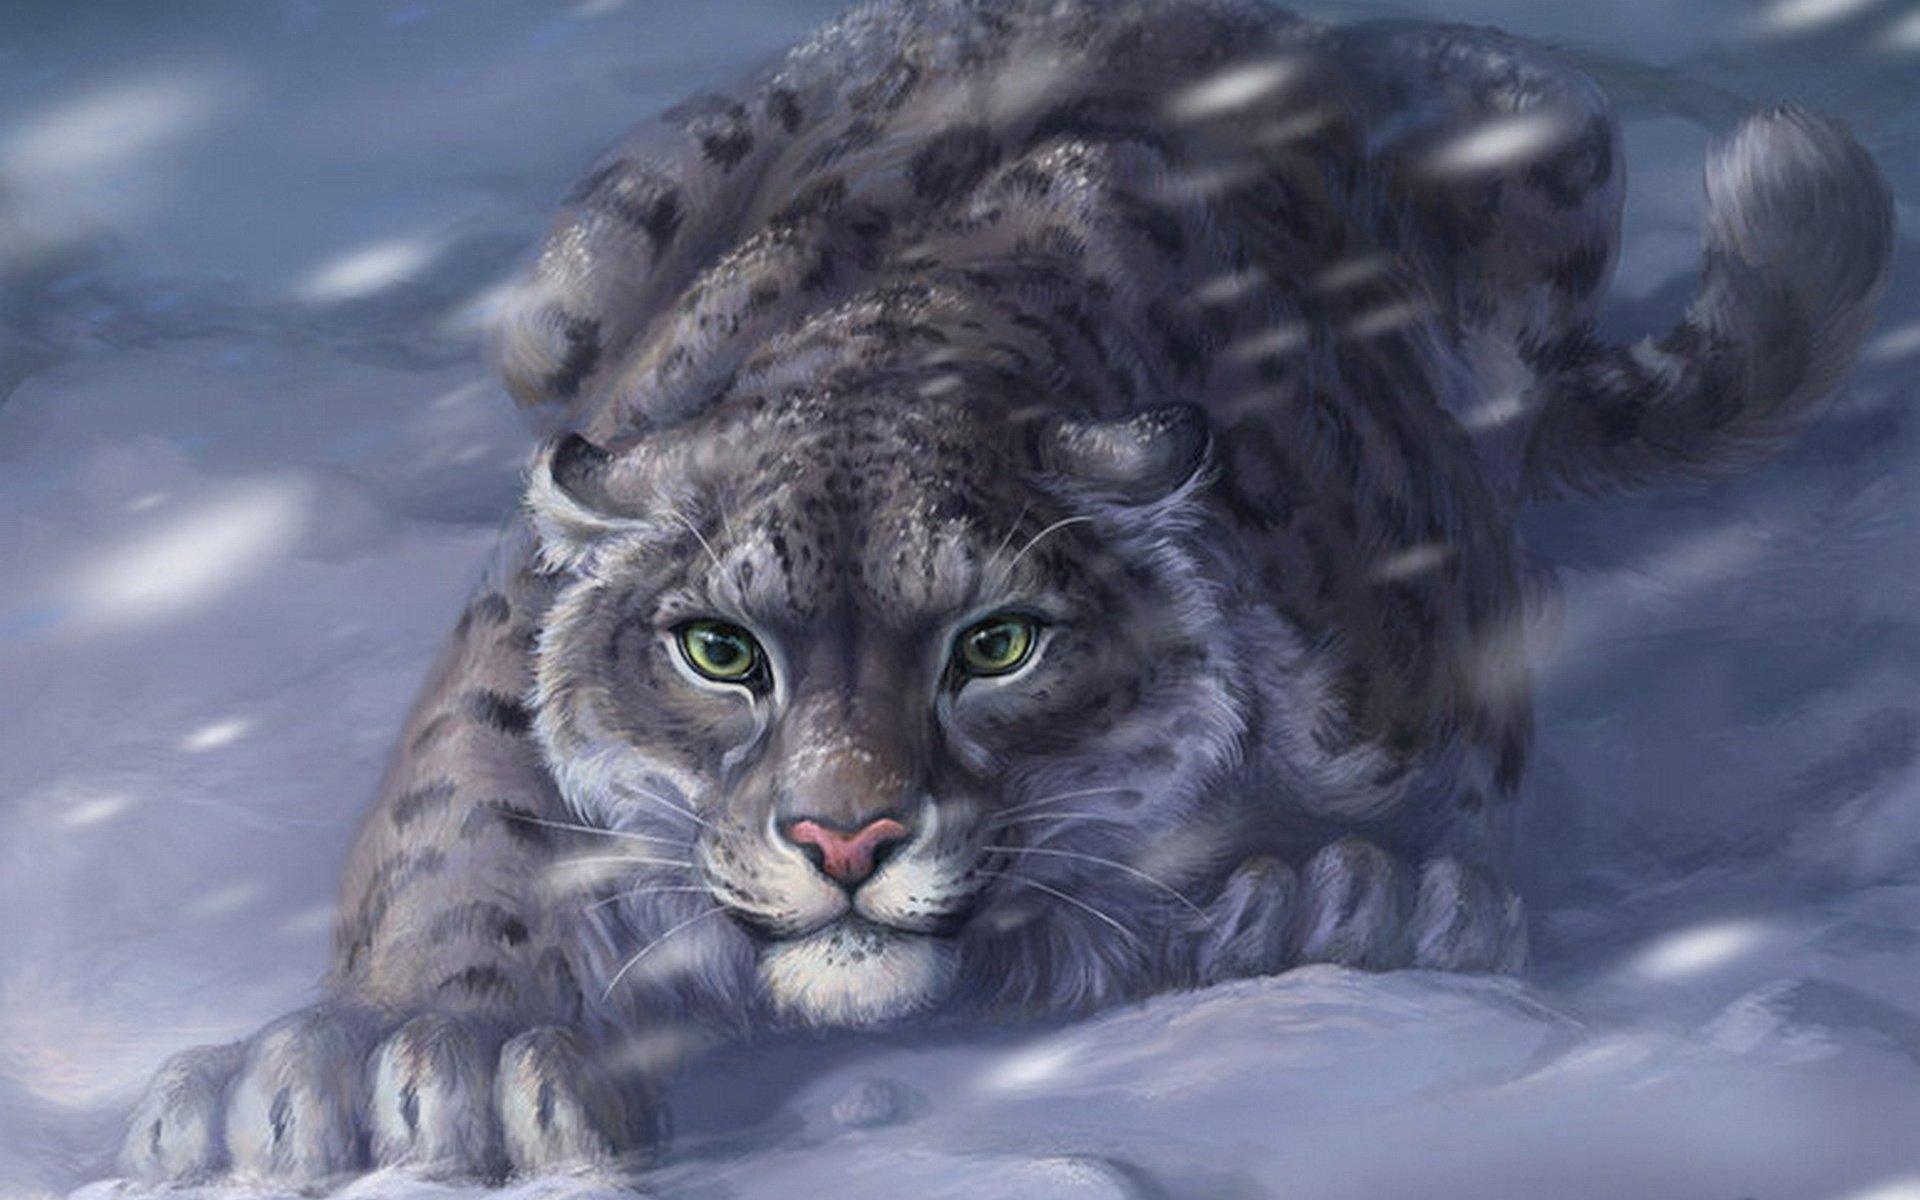 Digital Leopard Art Wallpapers: Snow Leopard HD Wallpaper